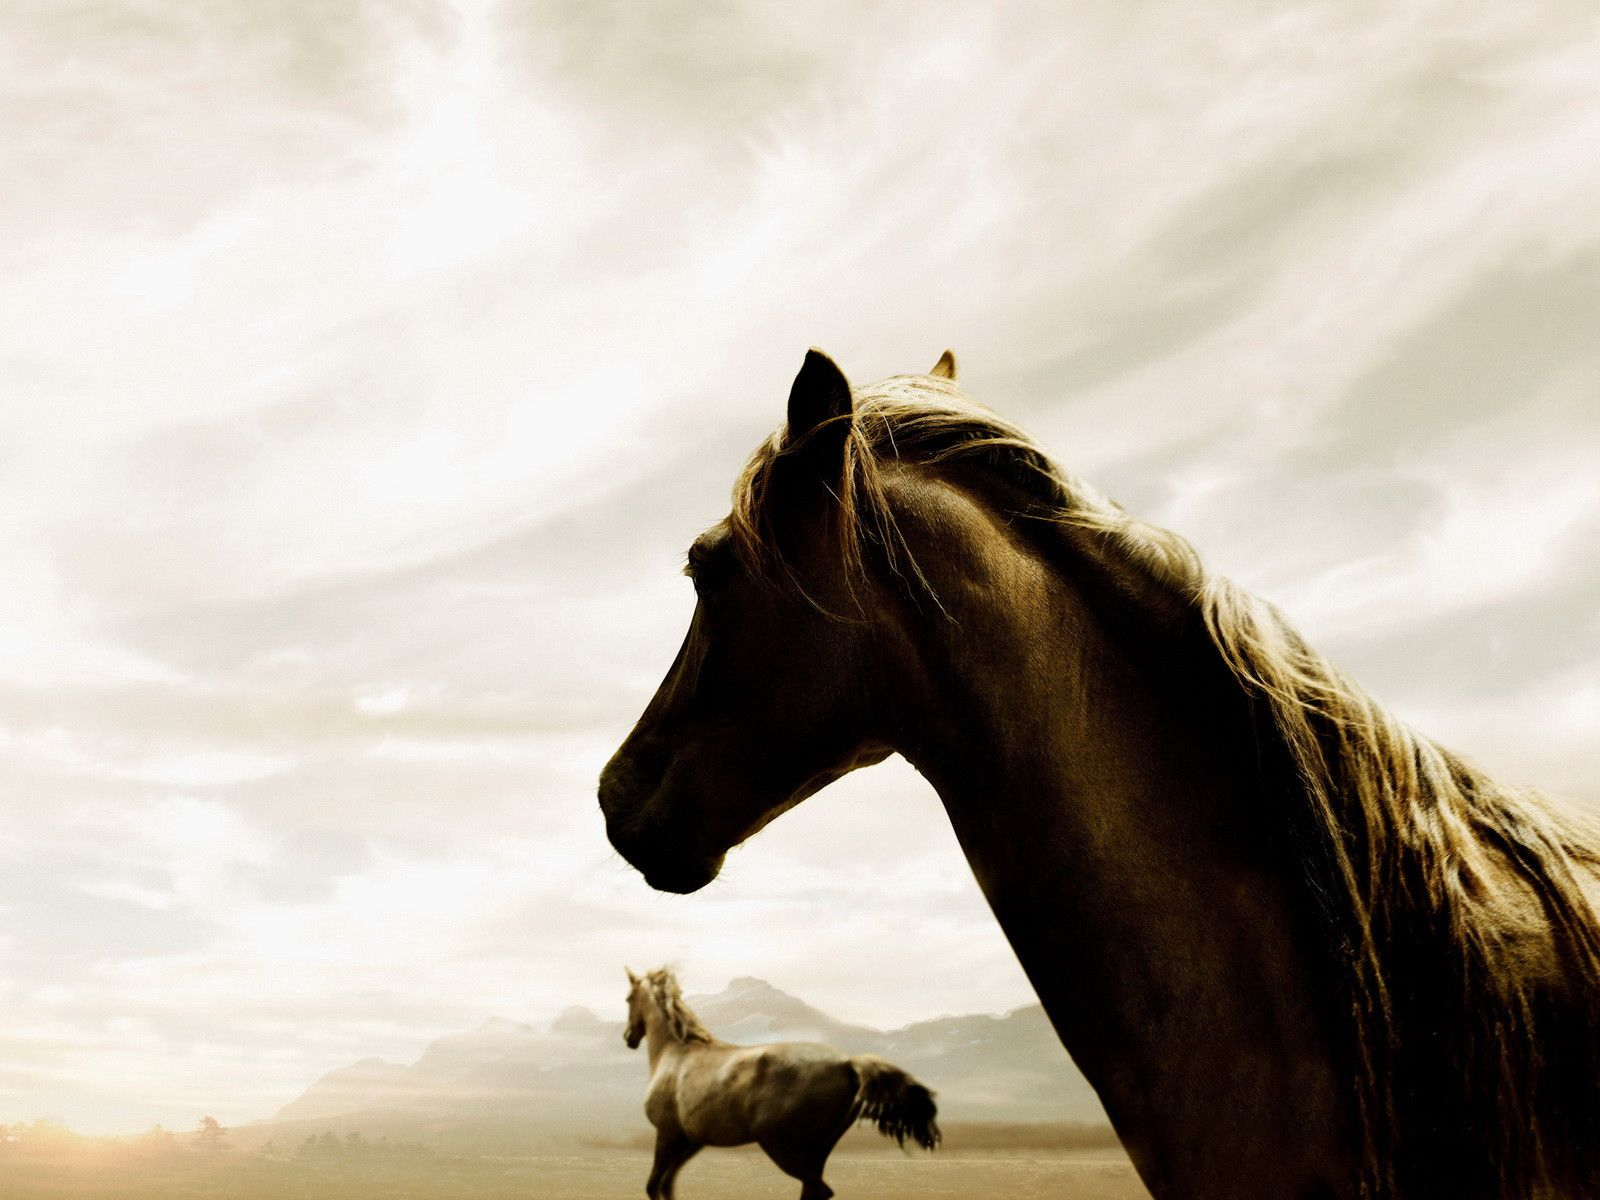 Aesthetic Black White Horse 1600x1200 Download Hd Wallpaper Wallpapertip